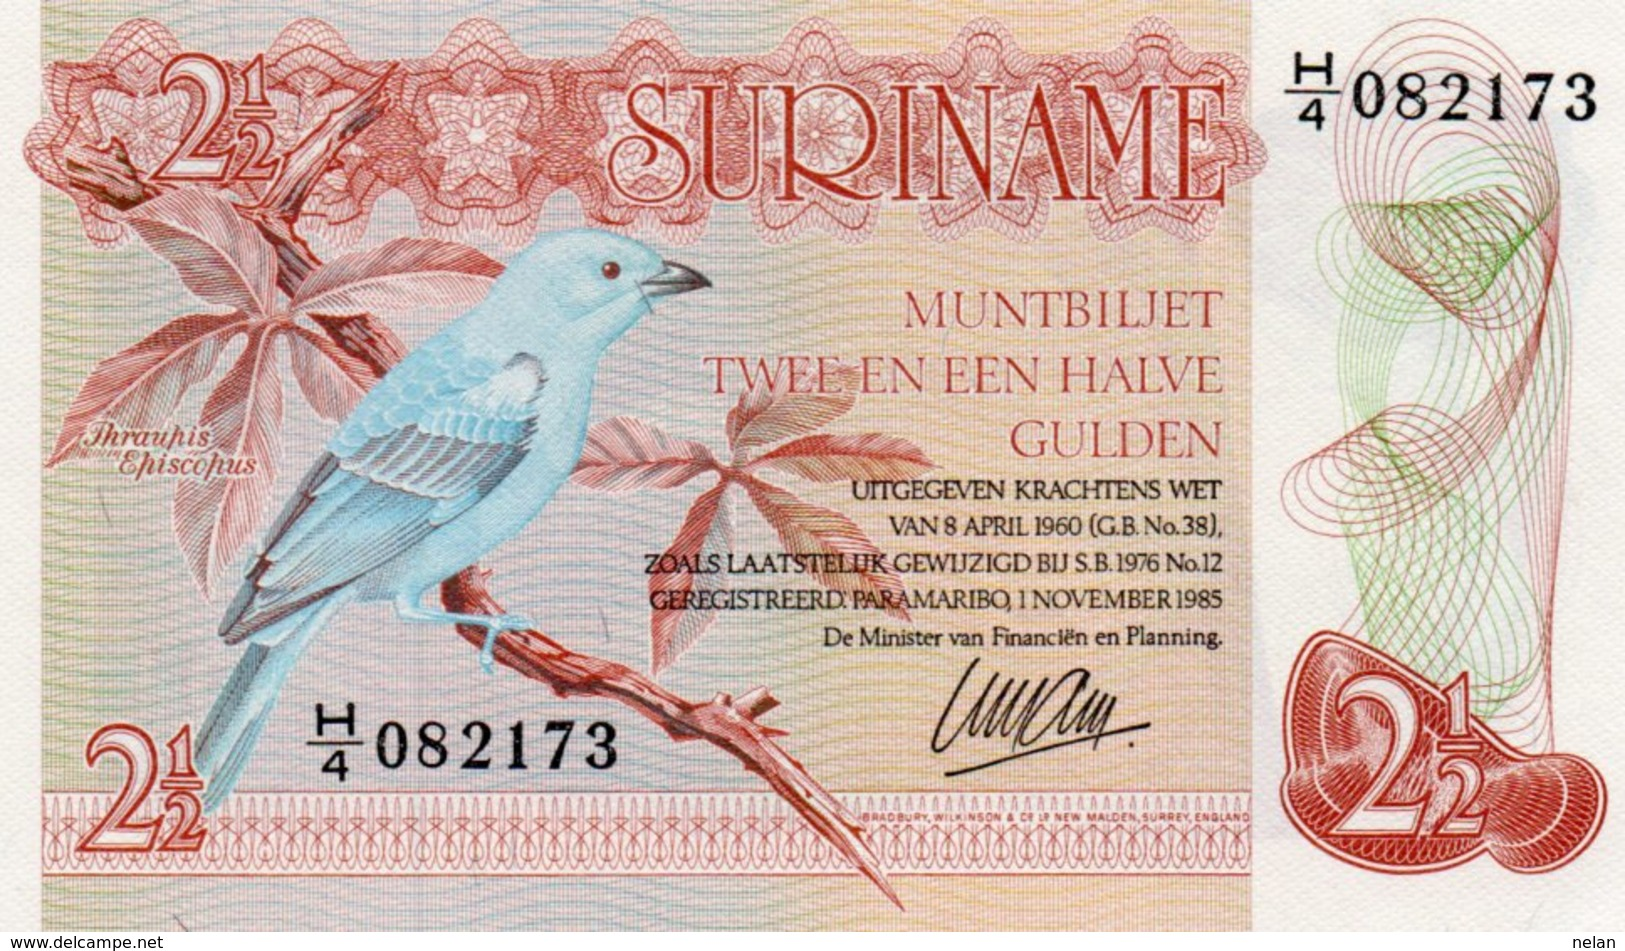 SURINAME 2½ Gulden 1985  P-119 UNC - Surinam